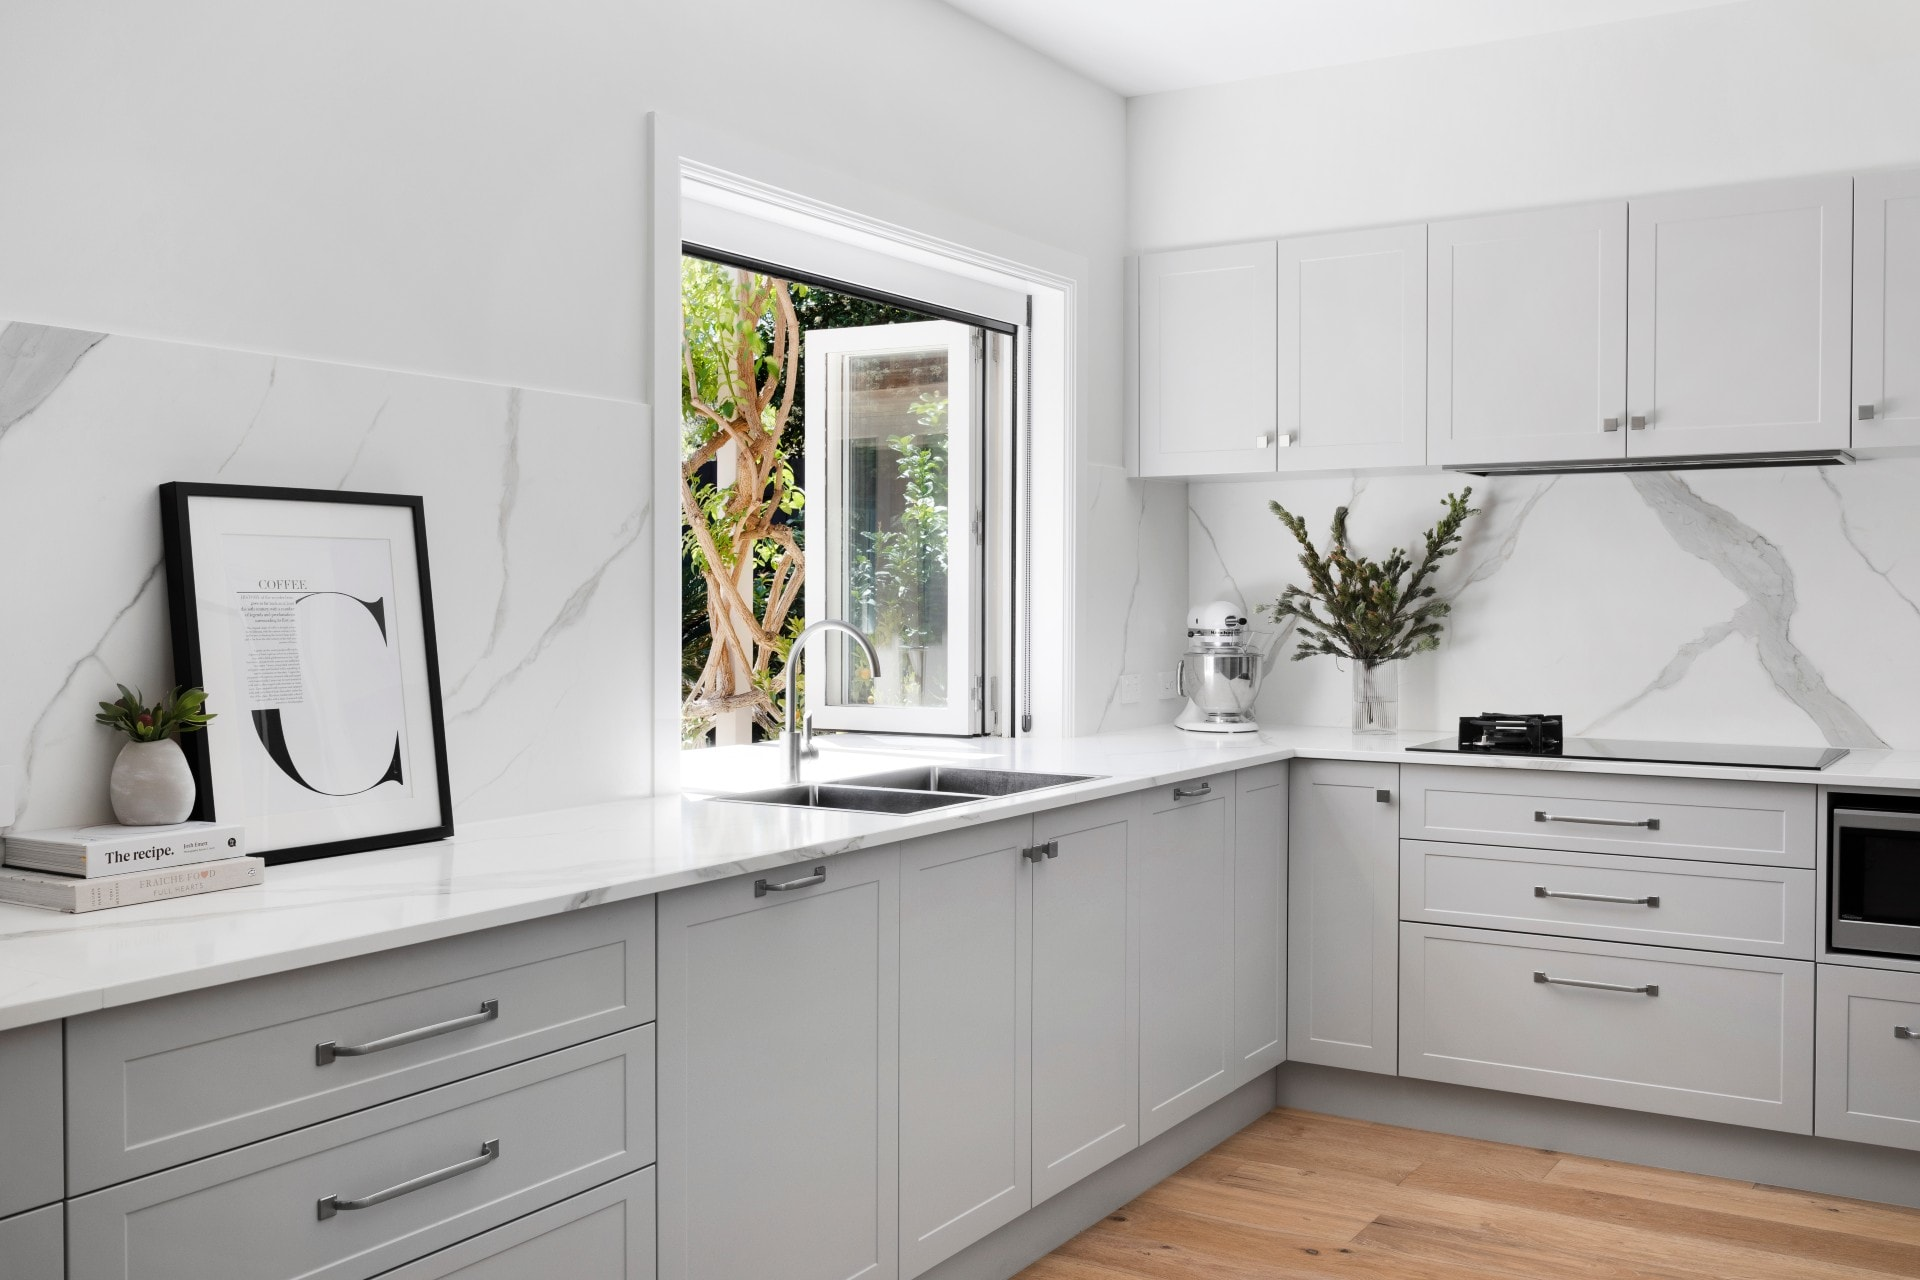 grey and white shaker style hamptons kitchen with oak flooring white stone splashback and servery window